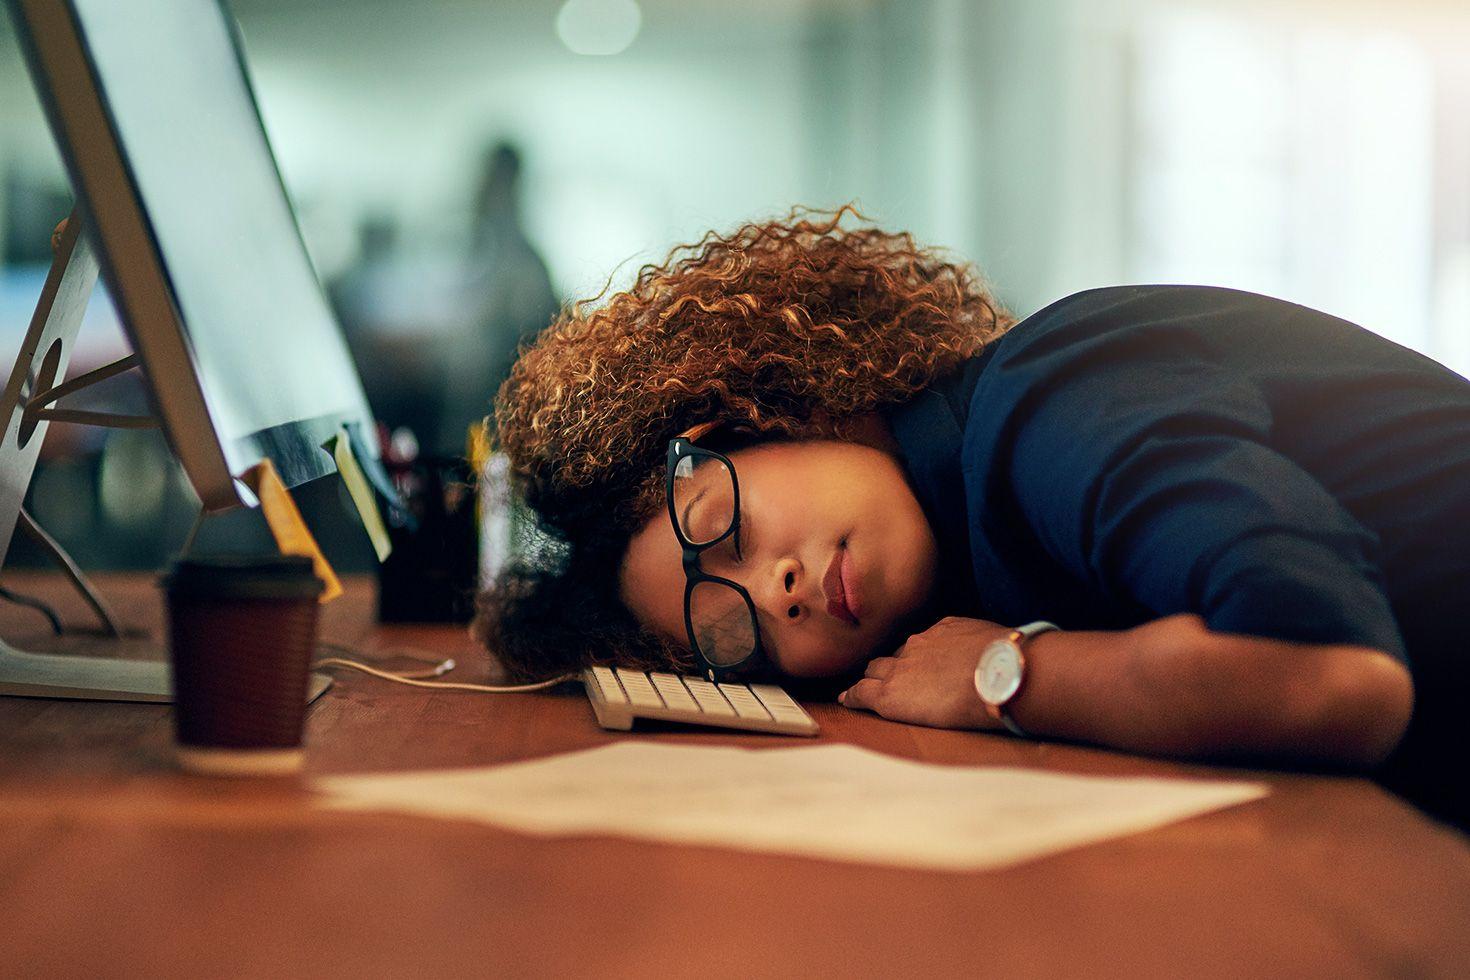 heart attack symptoms: fatigue